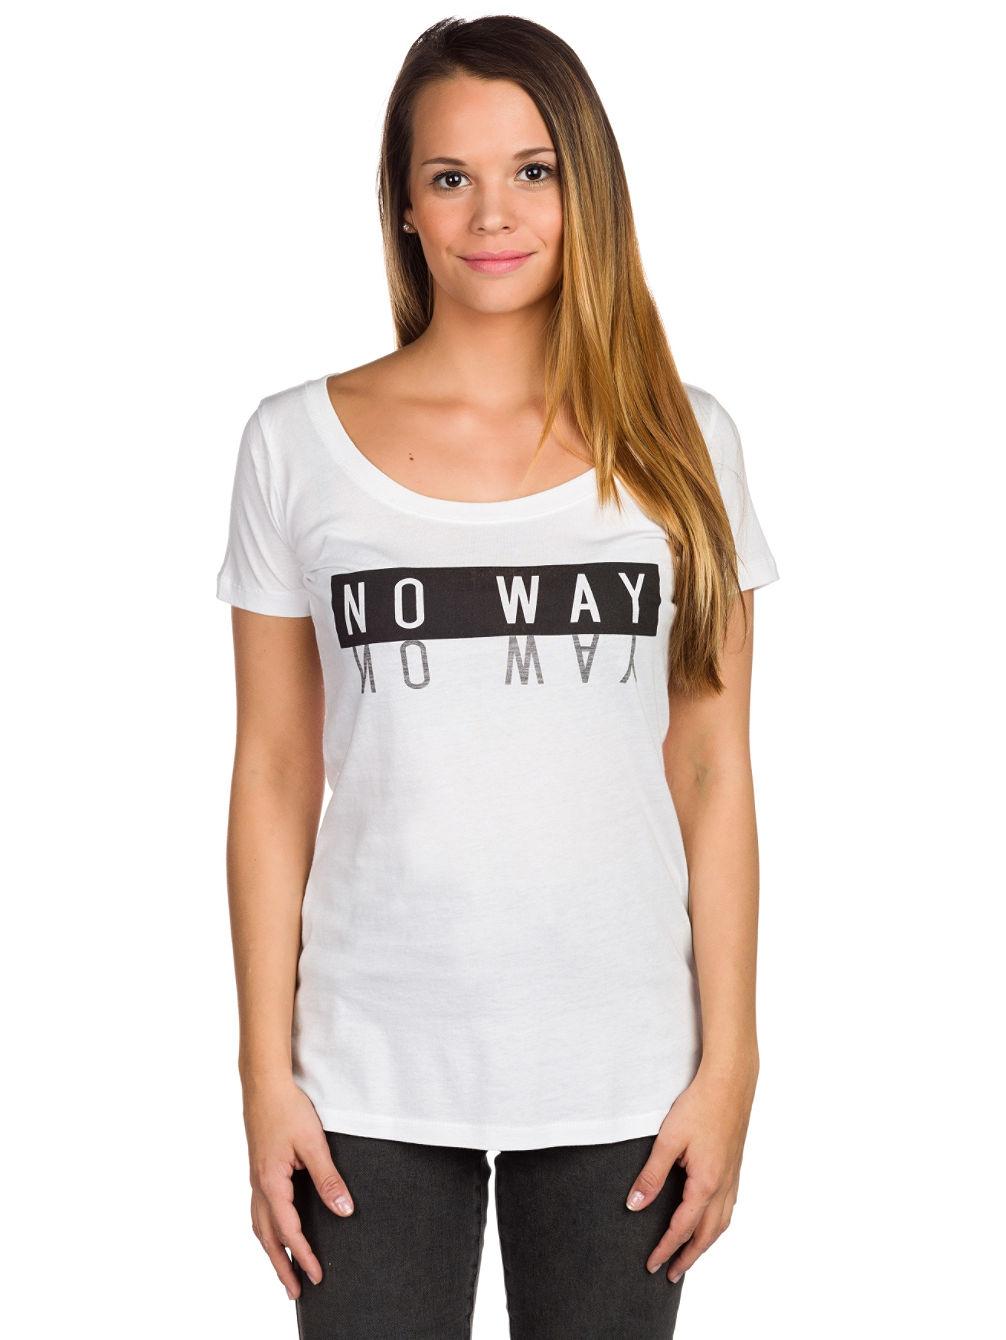 Buy Empyre Girls No Way T-Shirt online at blue-tomato.com